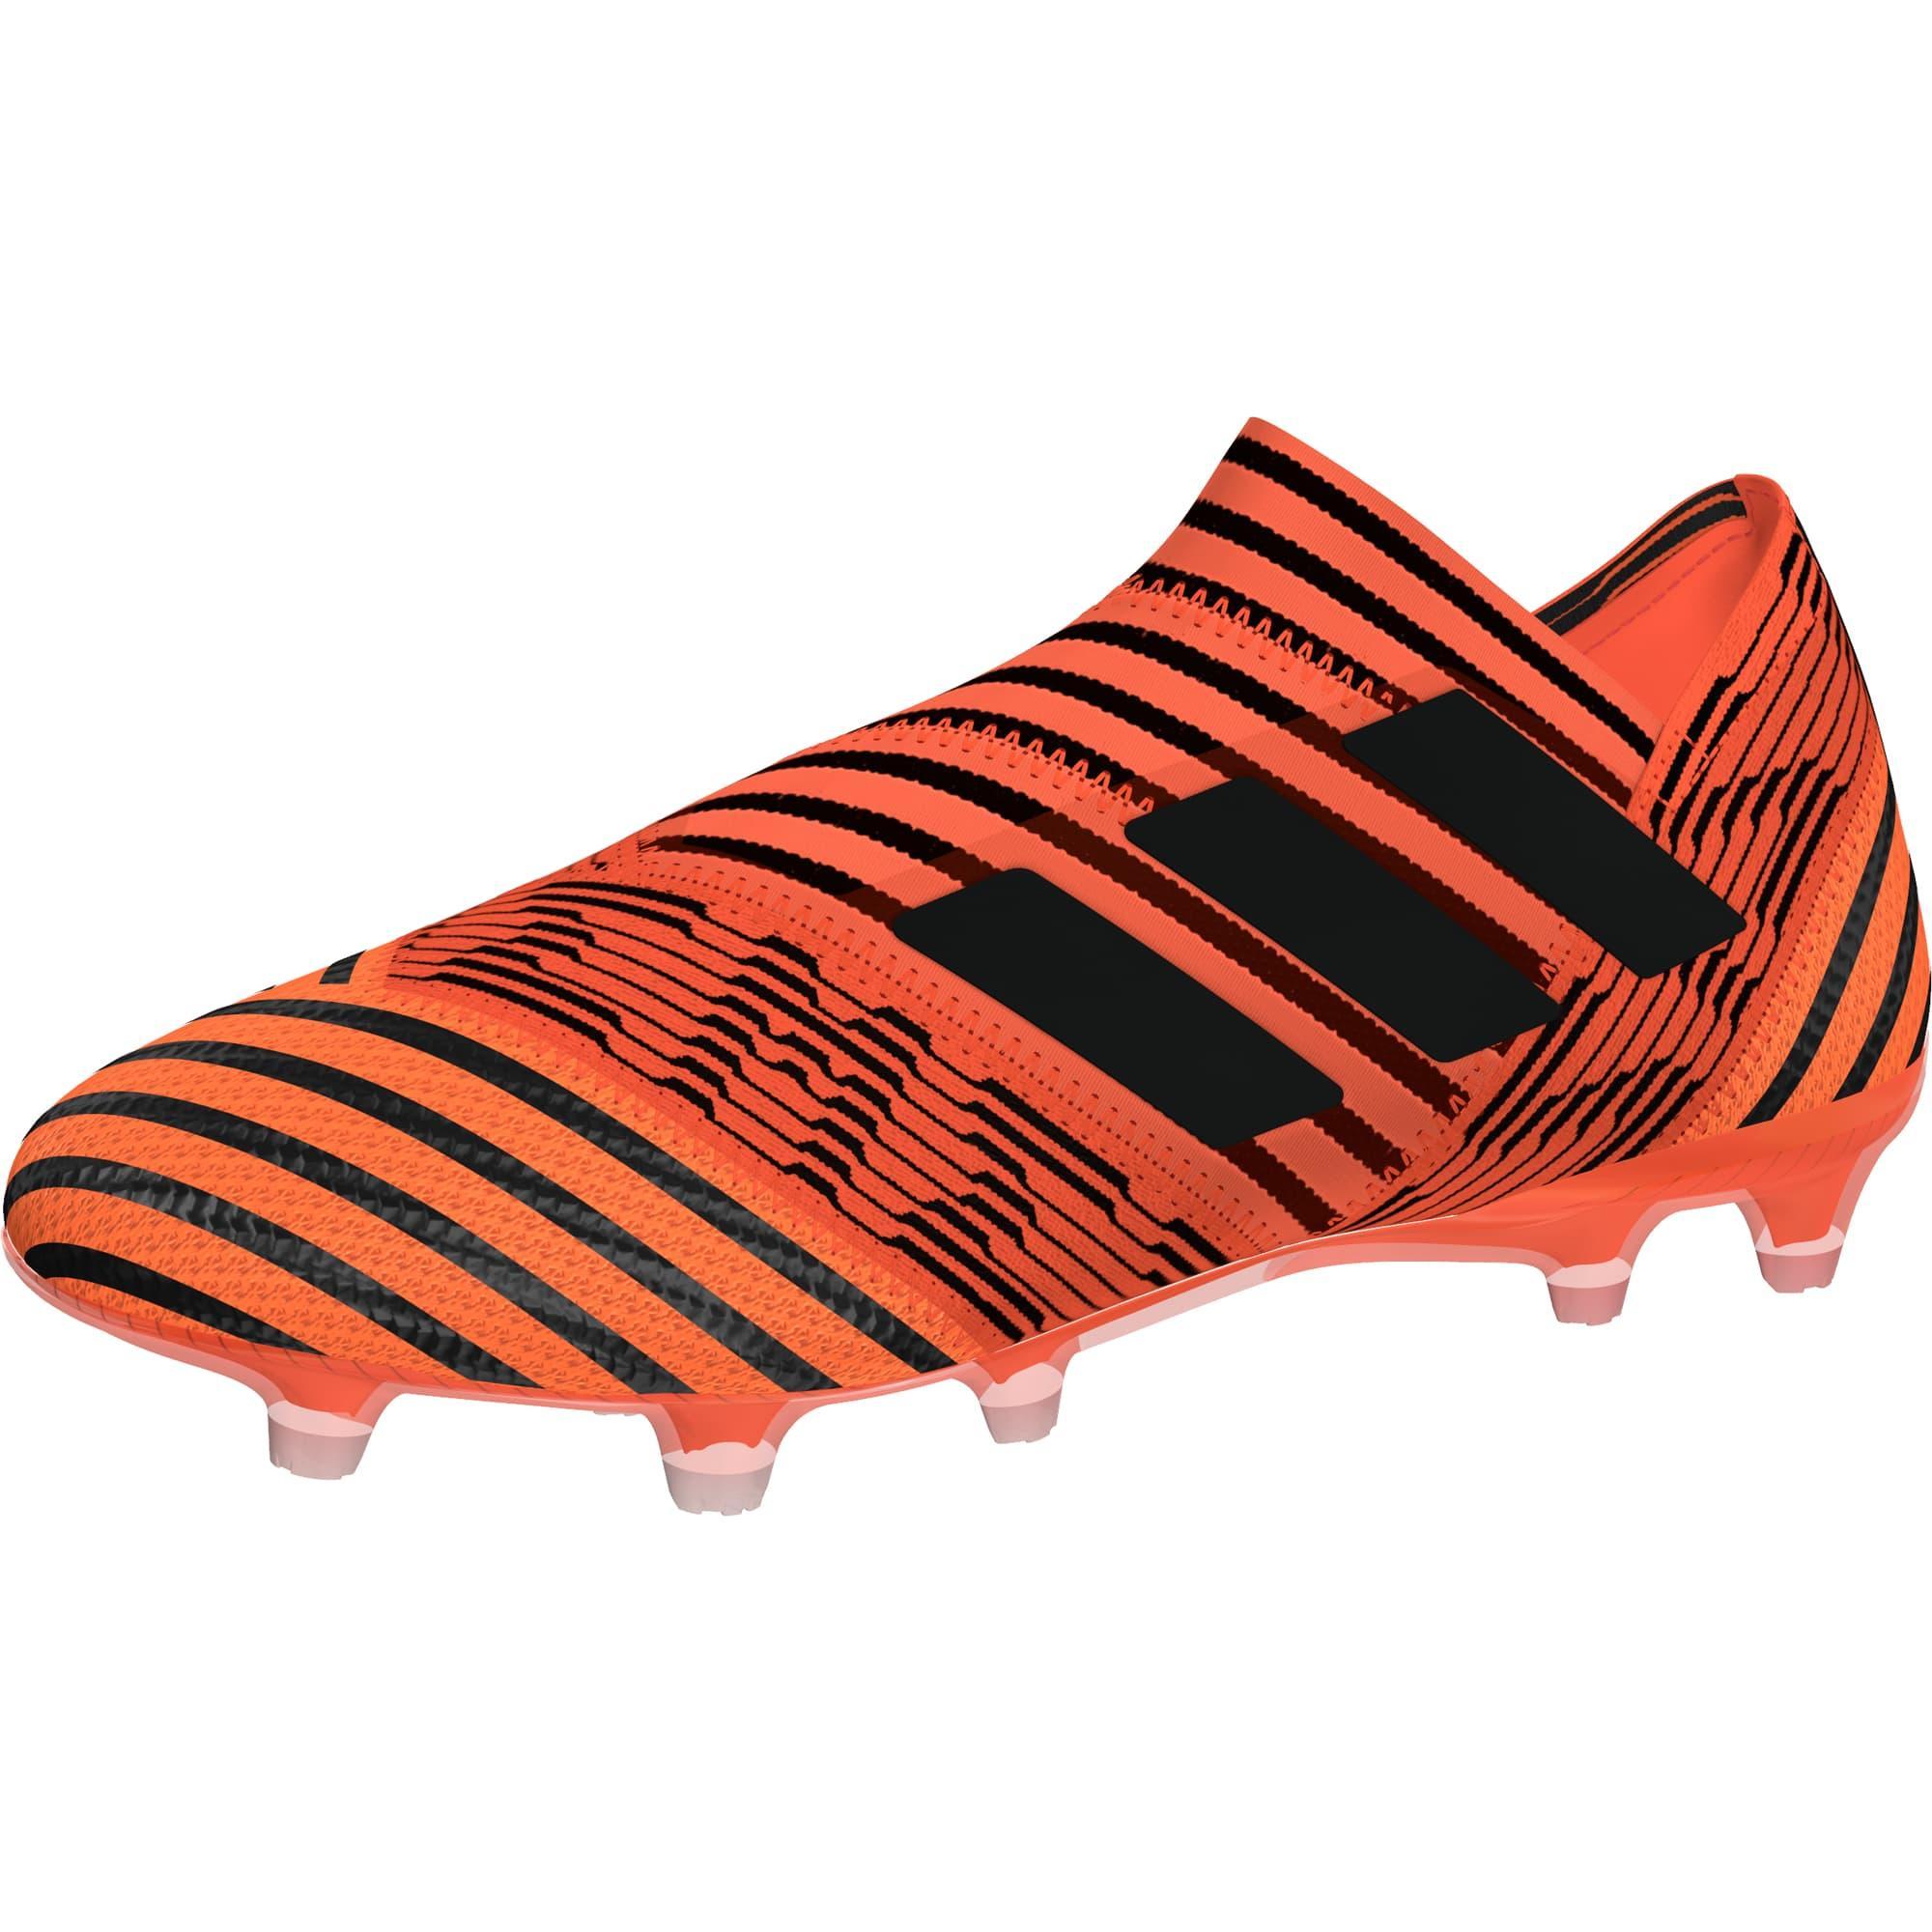 Adidas Nemeziz Territorio / Boot / Arancione Solare Nucleo Nero / Territorio Arancione Solare ce98ea